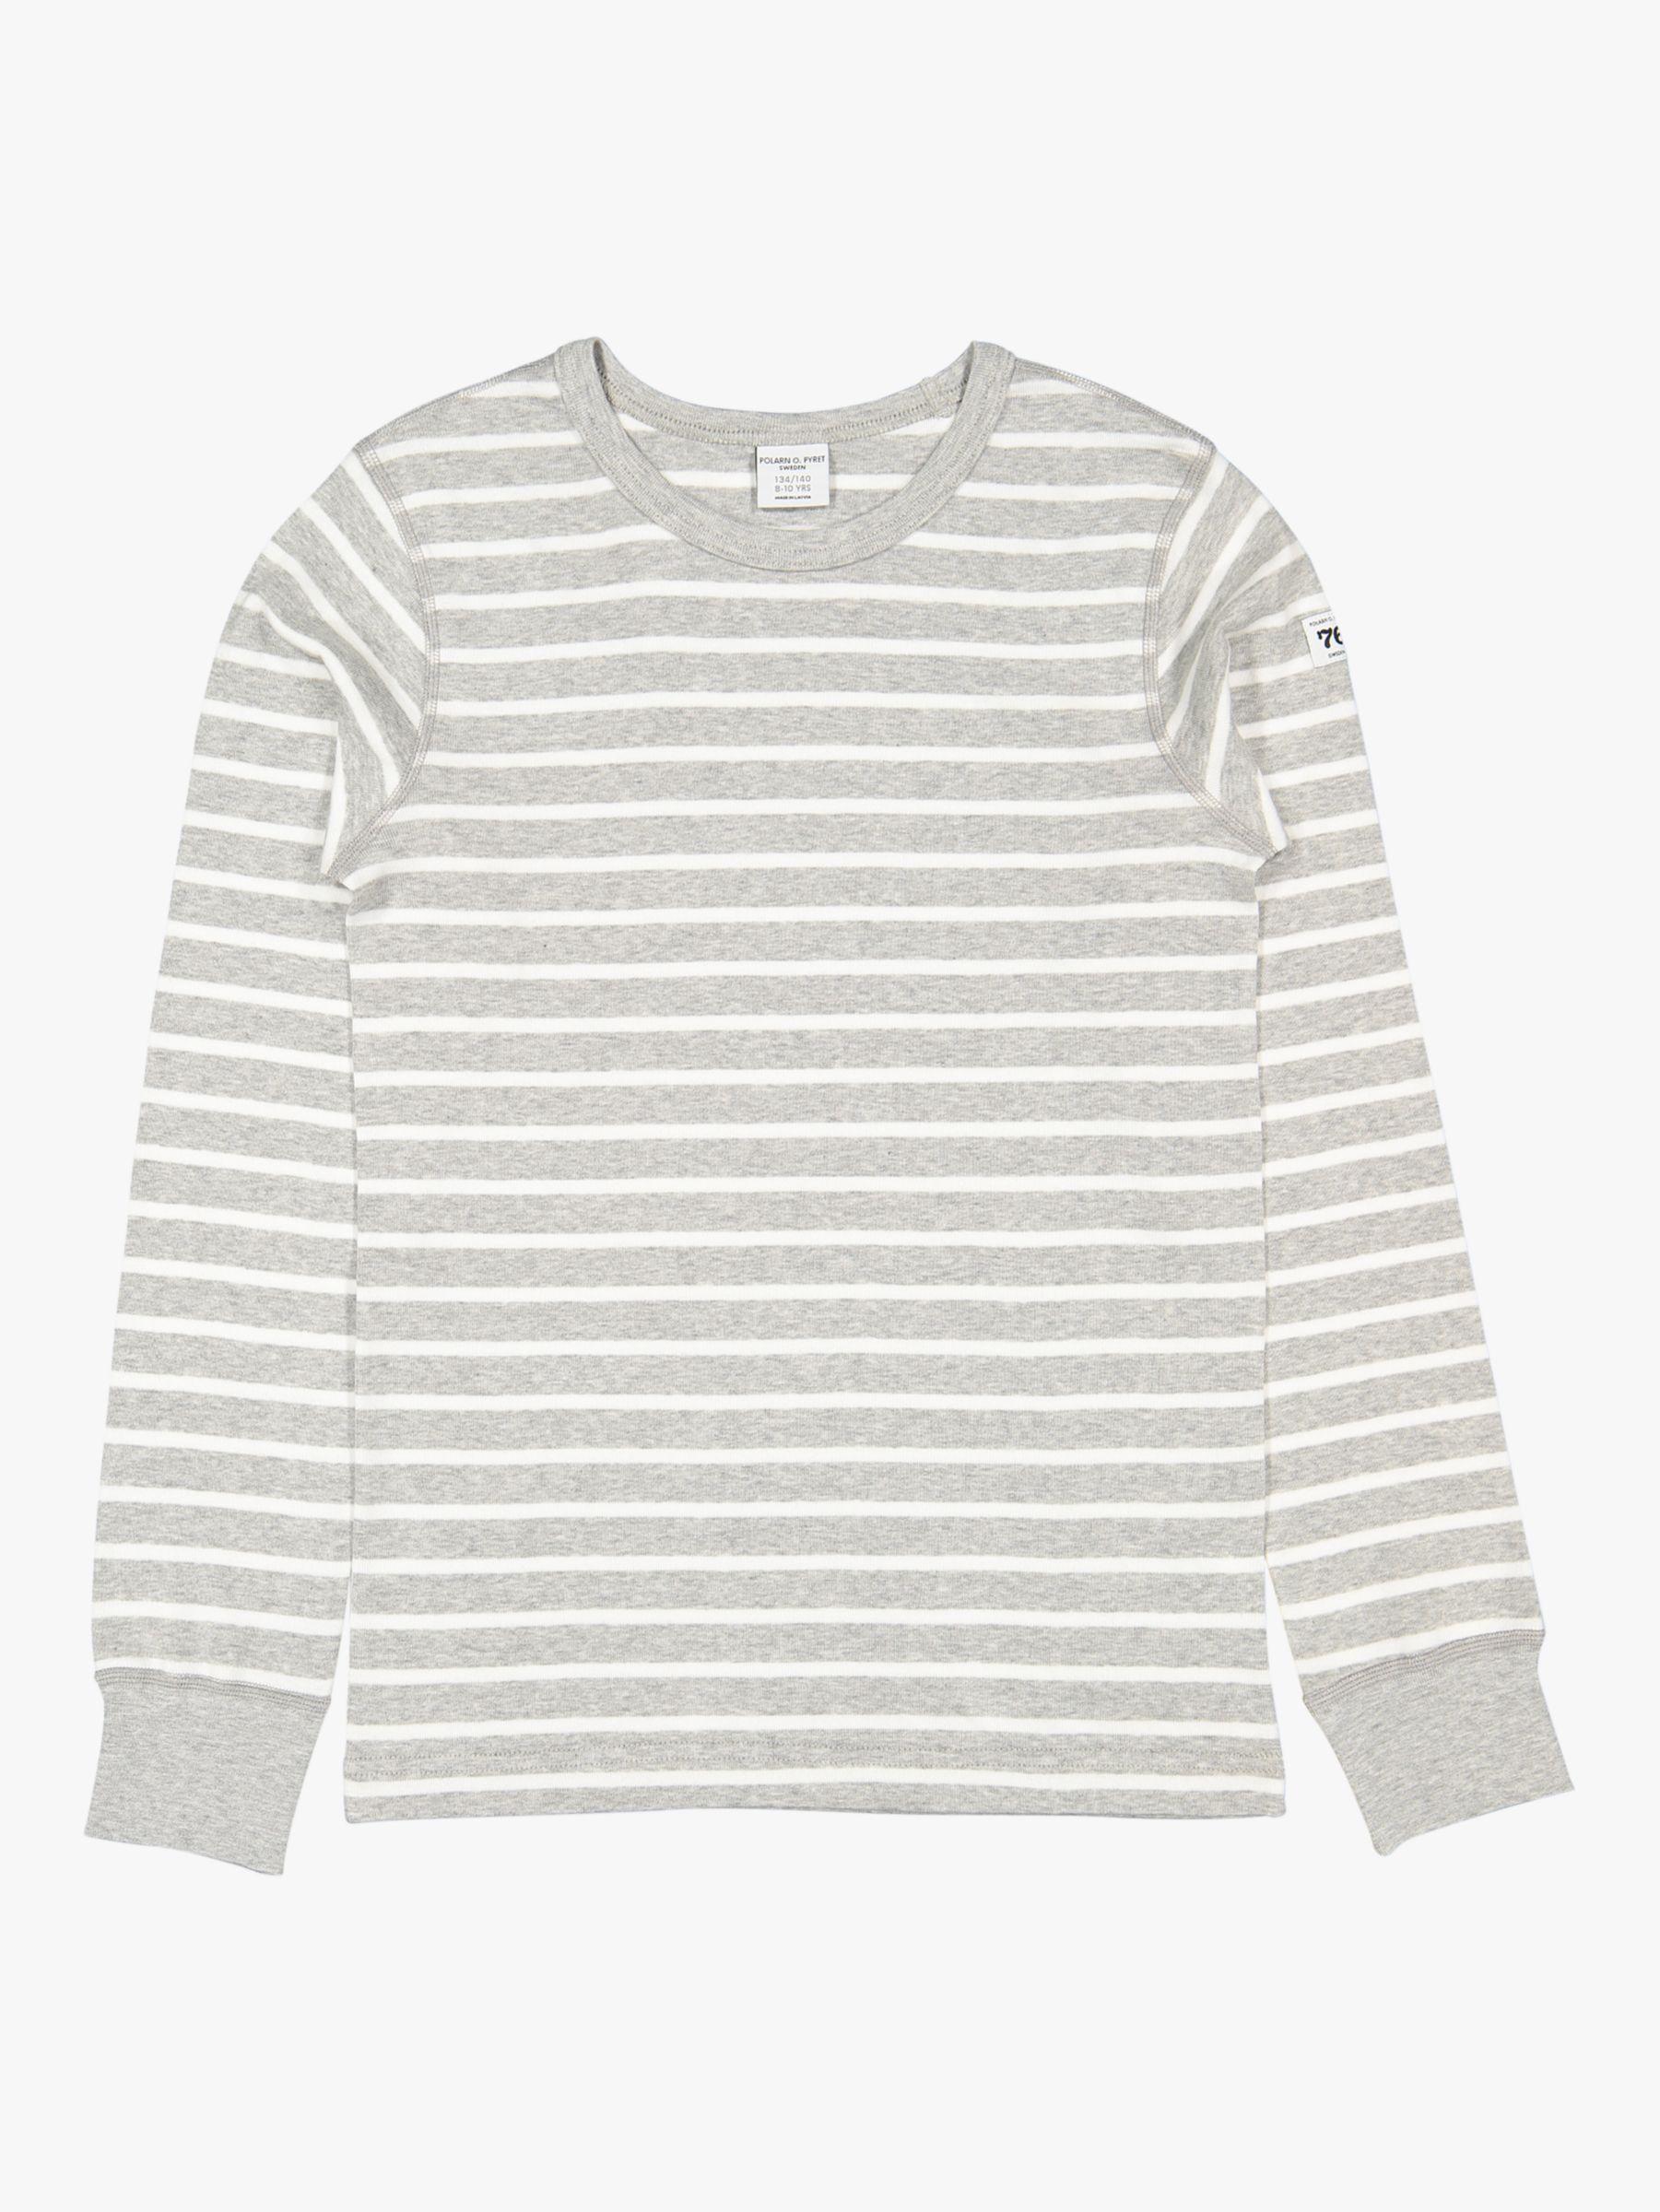 Polarn O. Pyret Polarn O. Pyret Children's GOTS Organic Cotton Stripe Long Sleeve Top, Grey